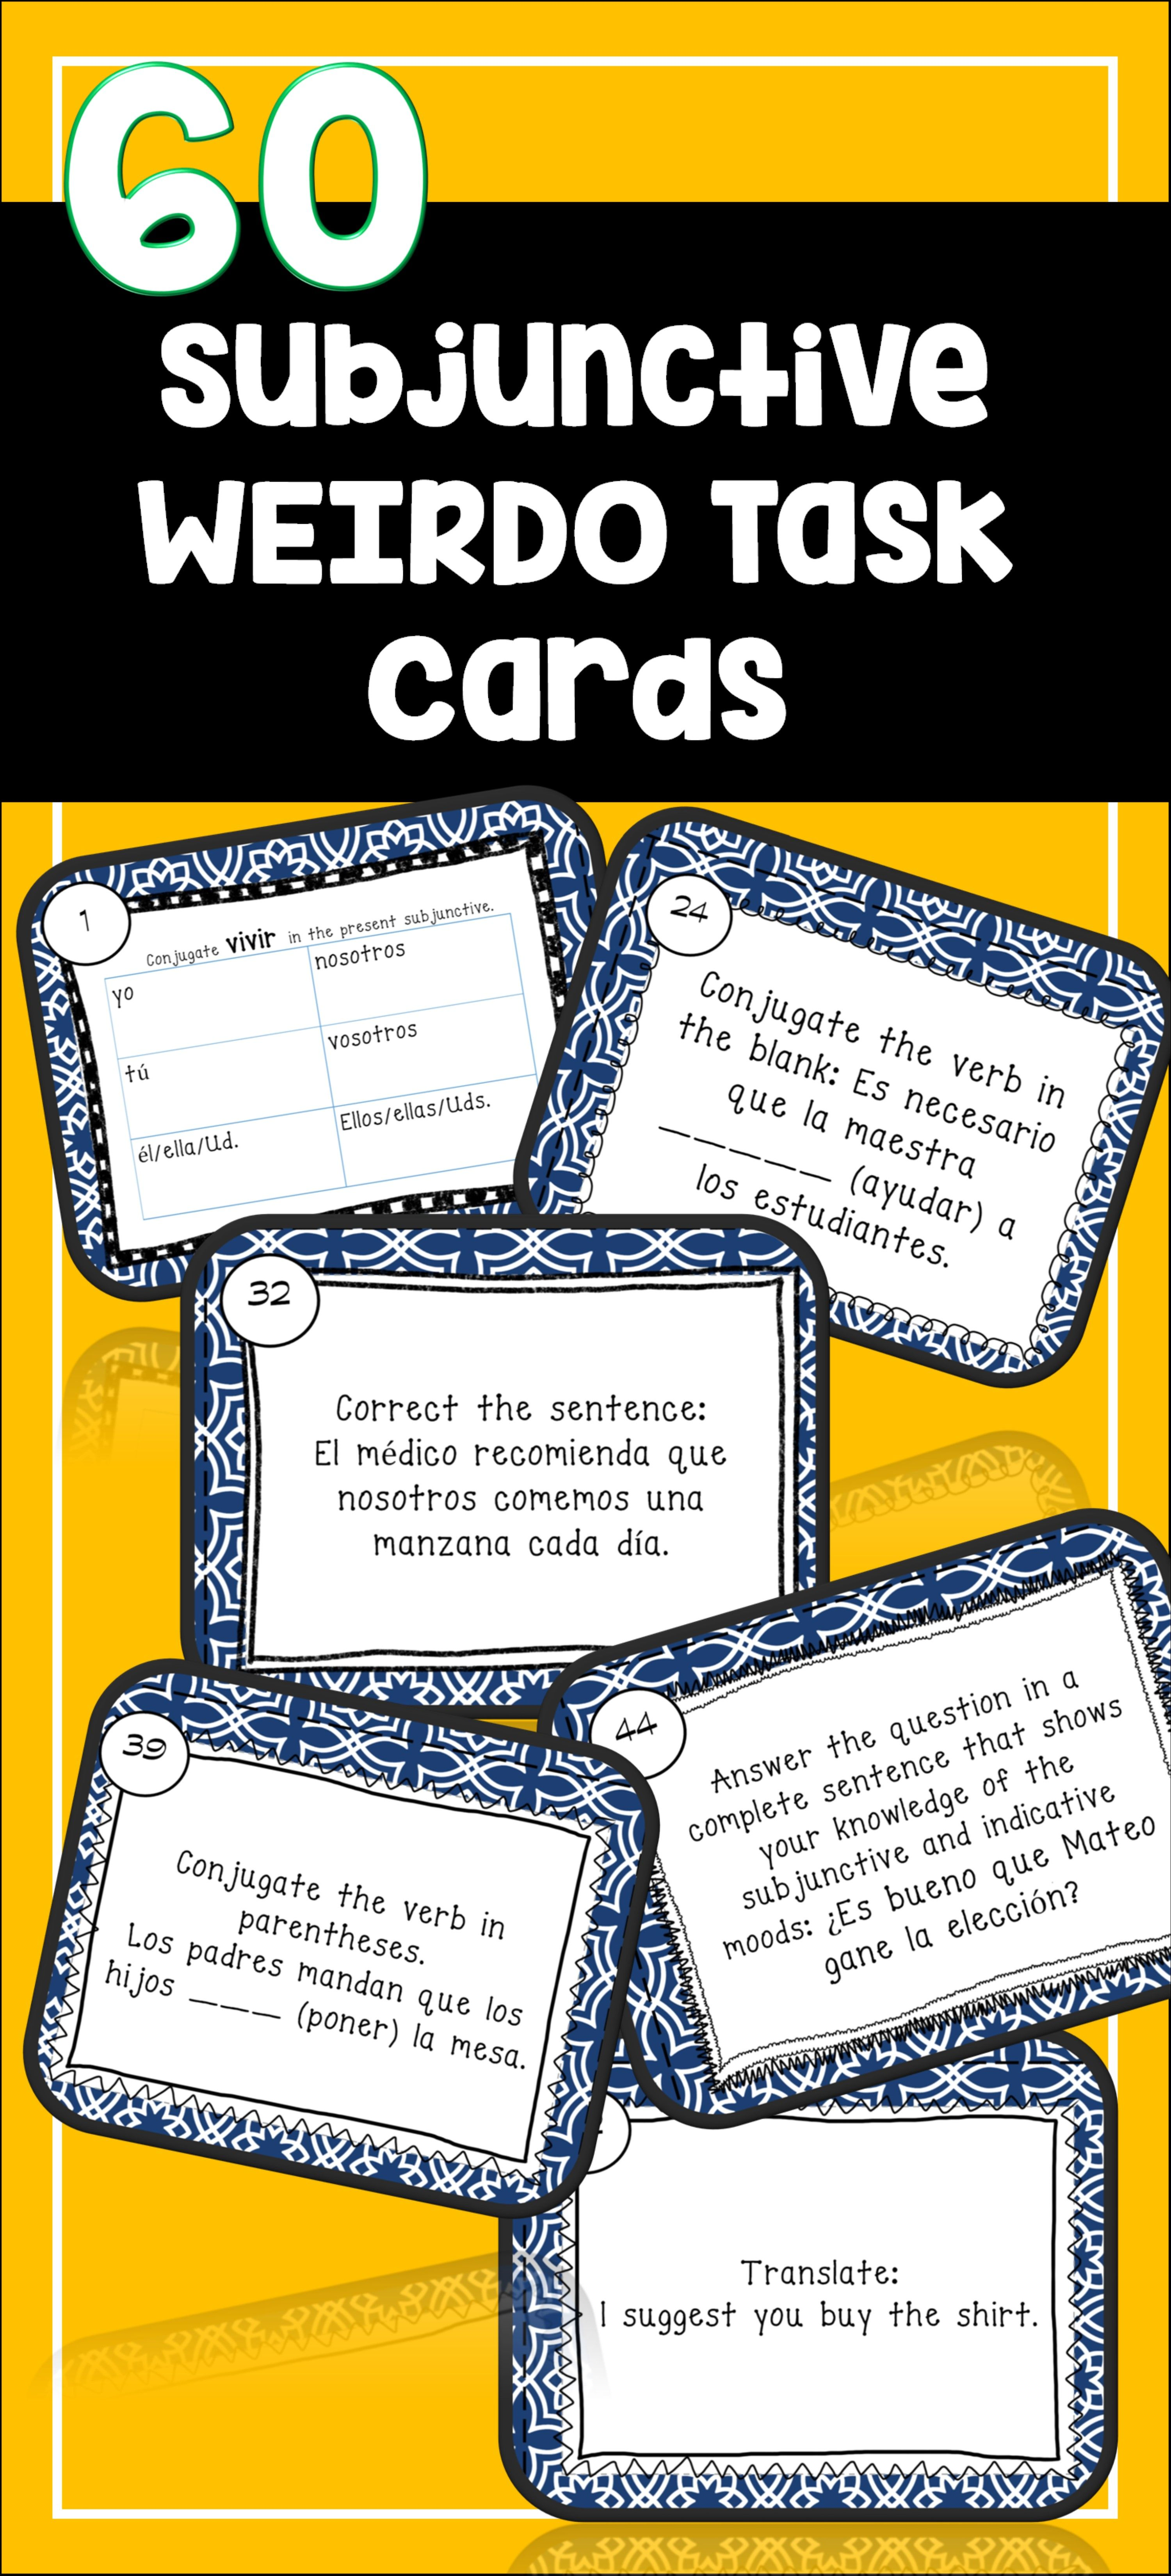 Spanish Subjunctive Task Cards With Weirdo El Subjuntivo